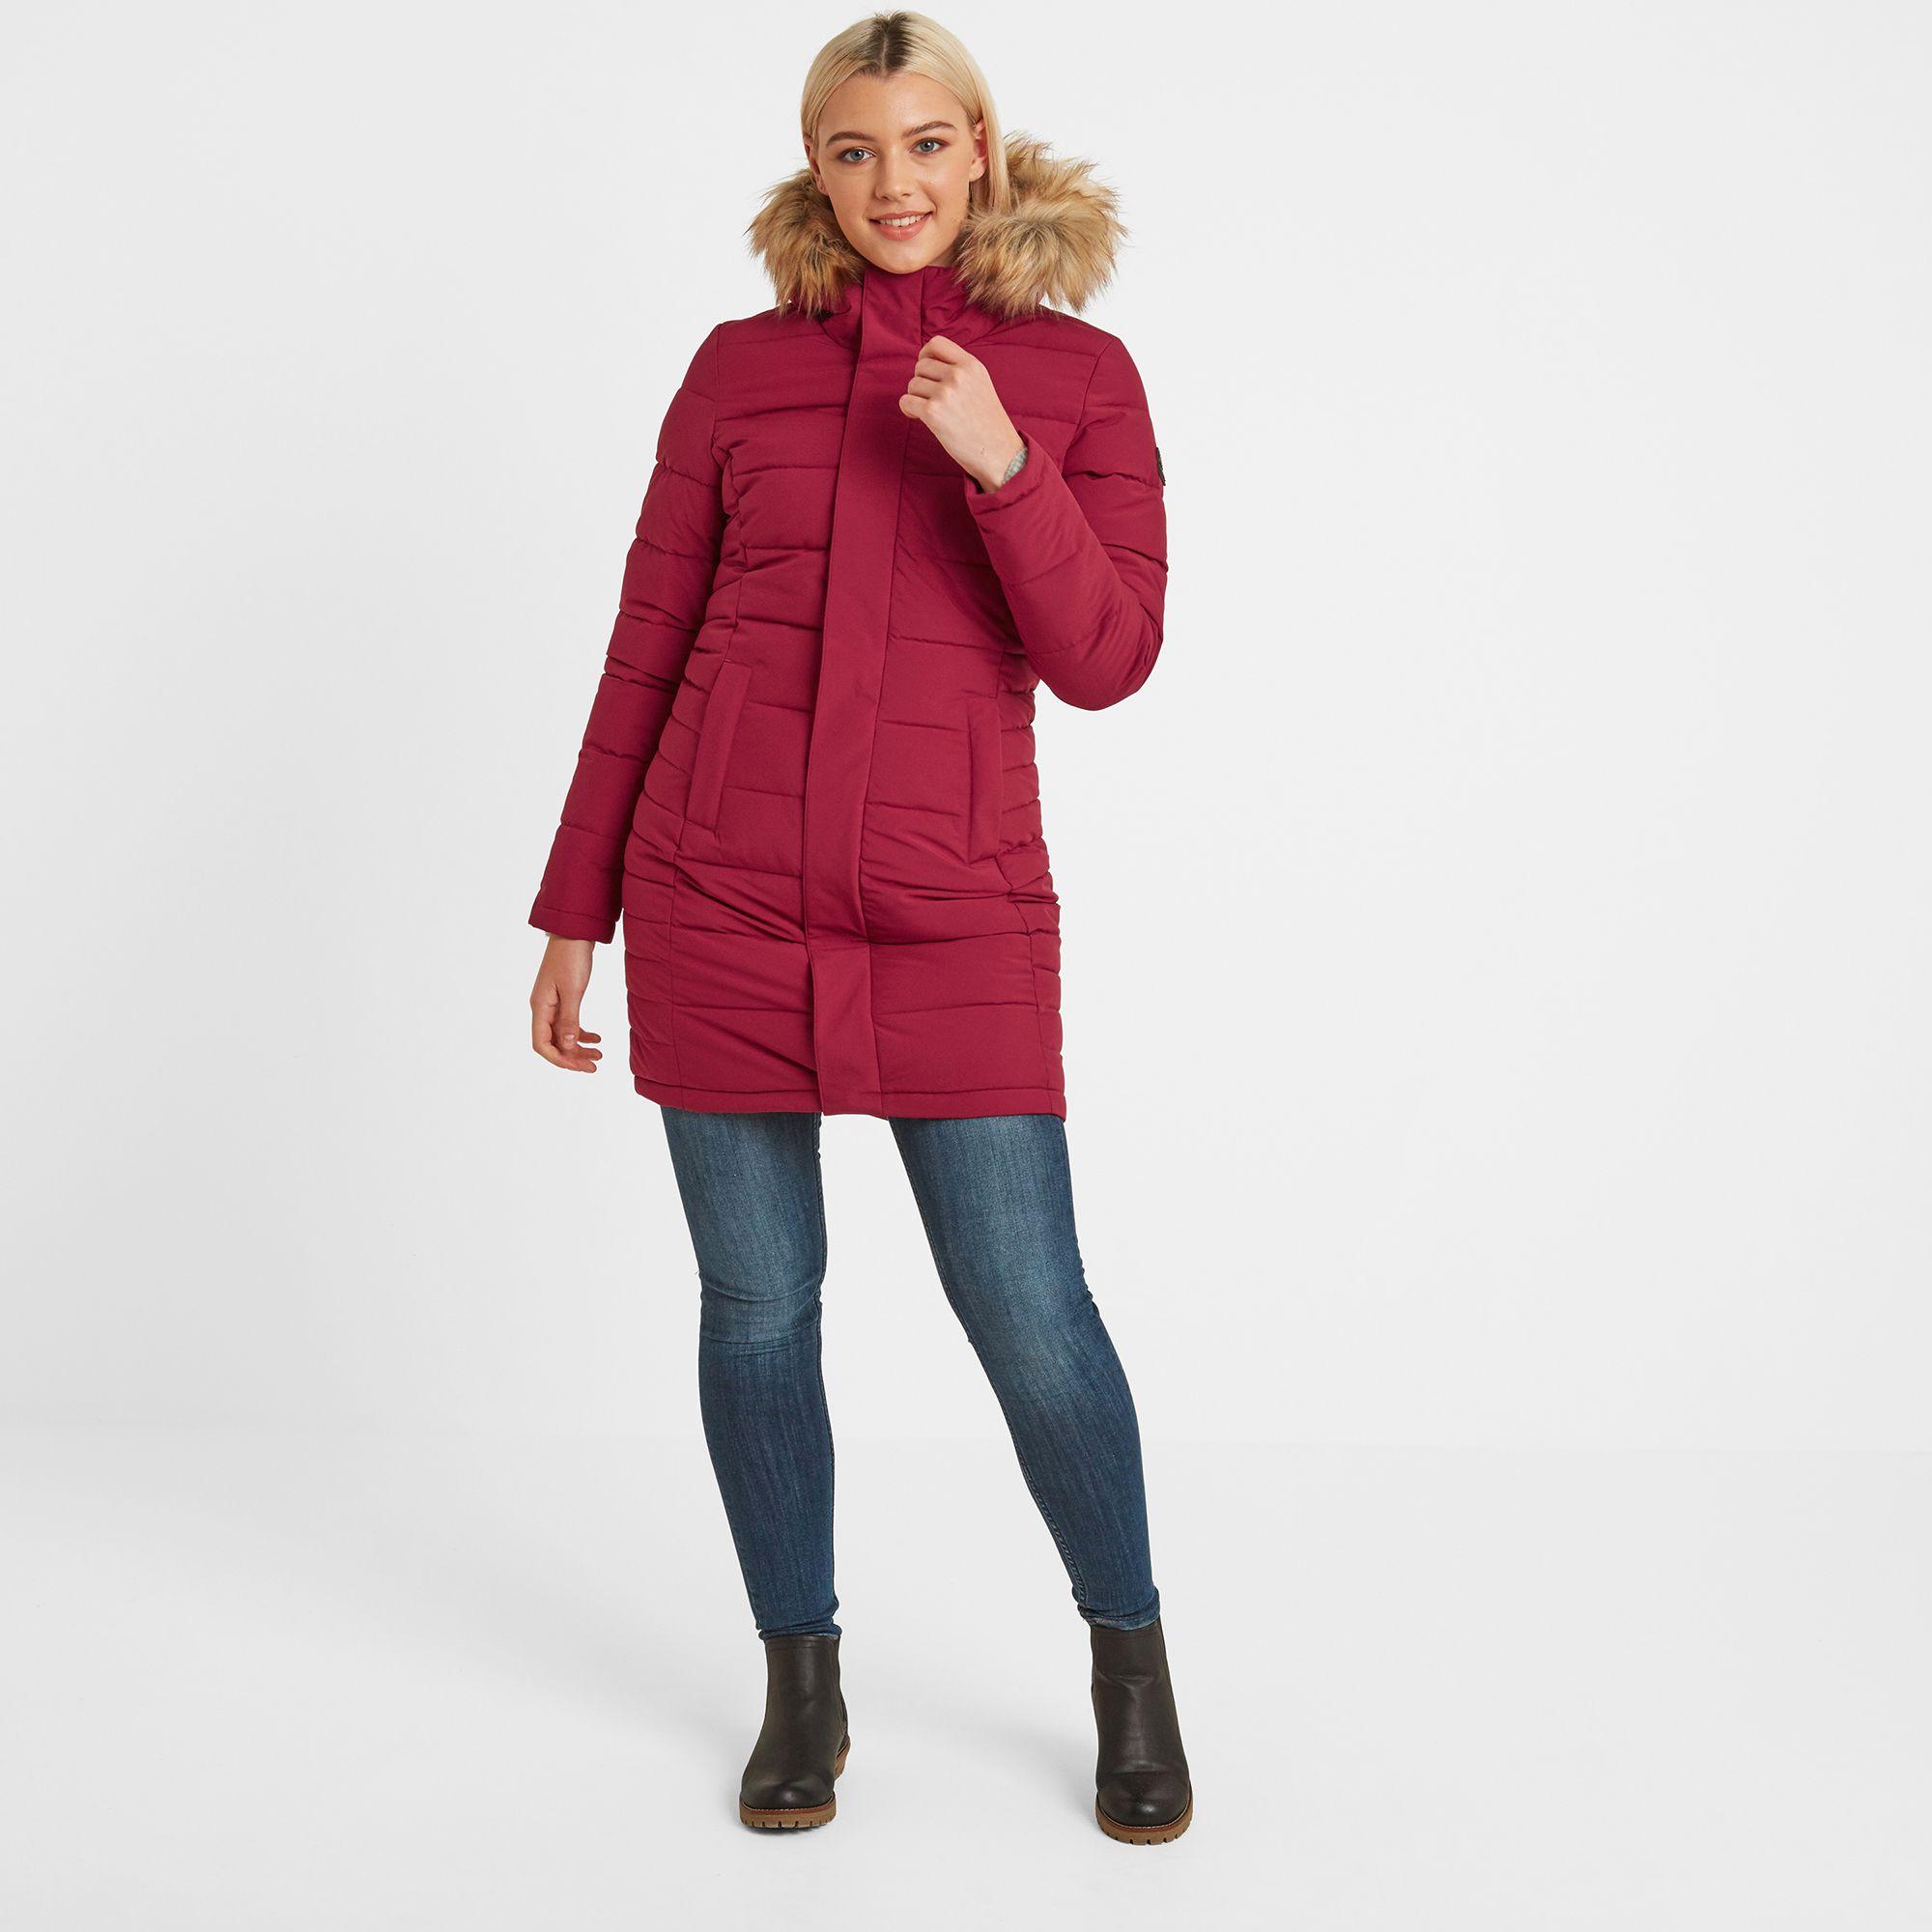 Firbeck Womens Long Insulated Jacket Raspberry